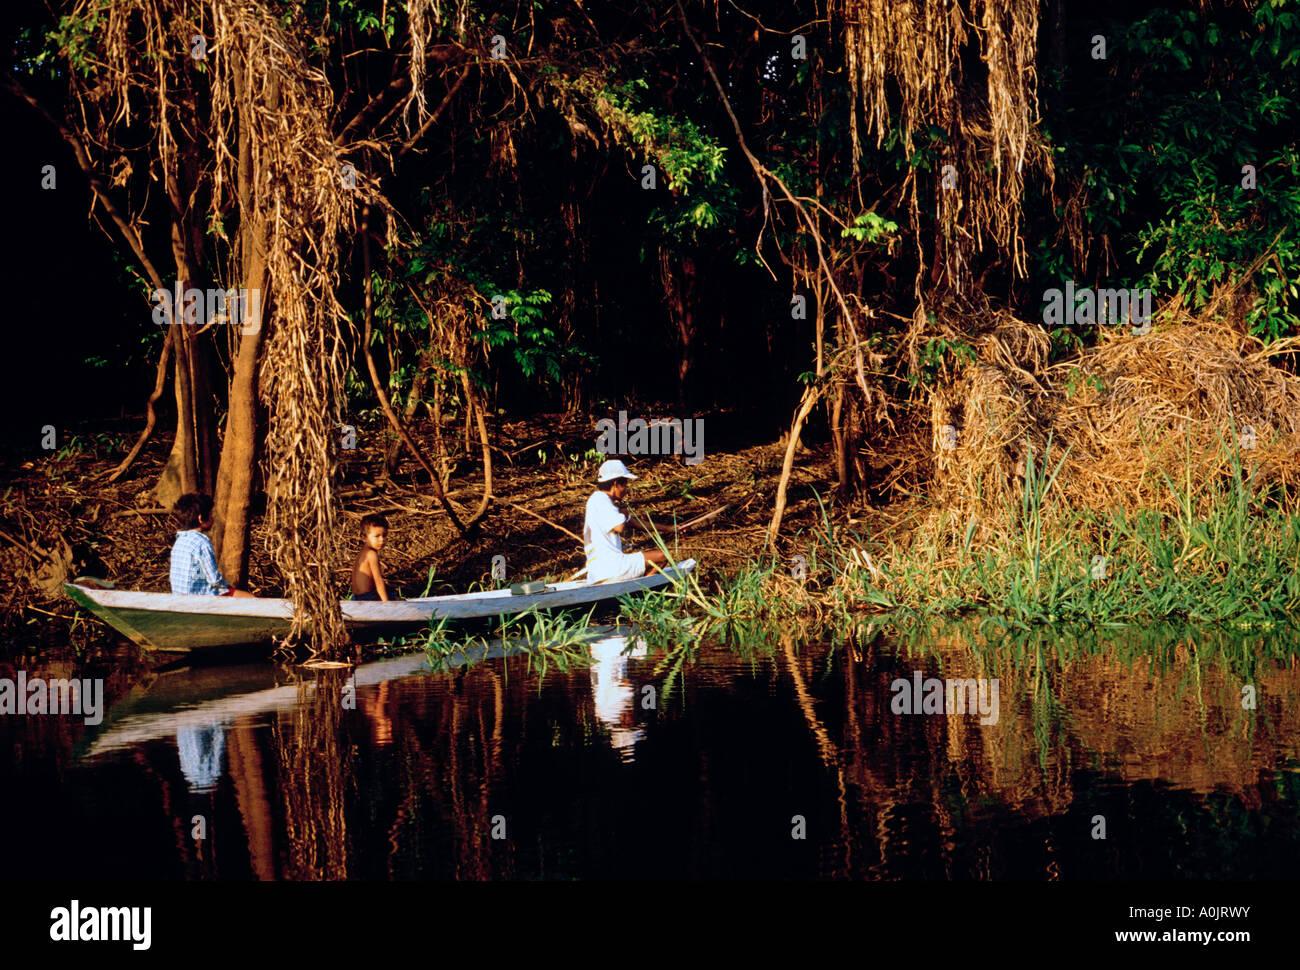 Brazilian man fishing with bow and arrow, father and sons, Obim Lake, Amazon River Basin, northwest of Manaus, Amazonas - Stock Image